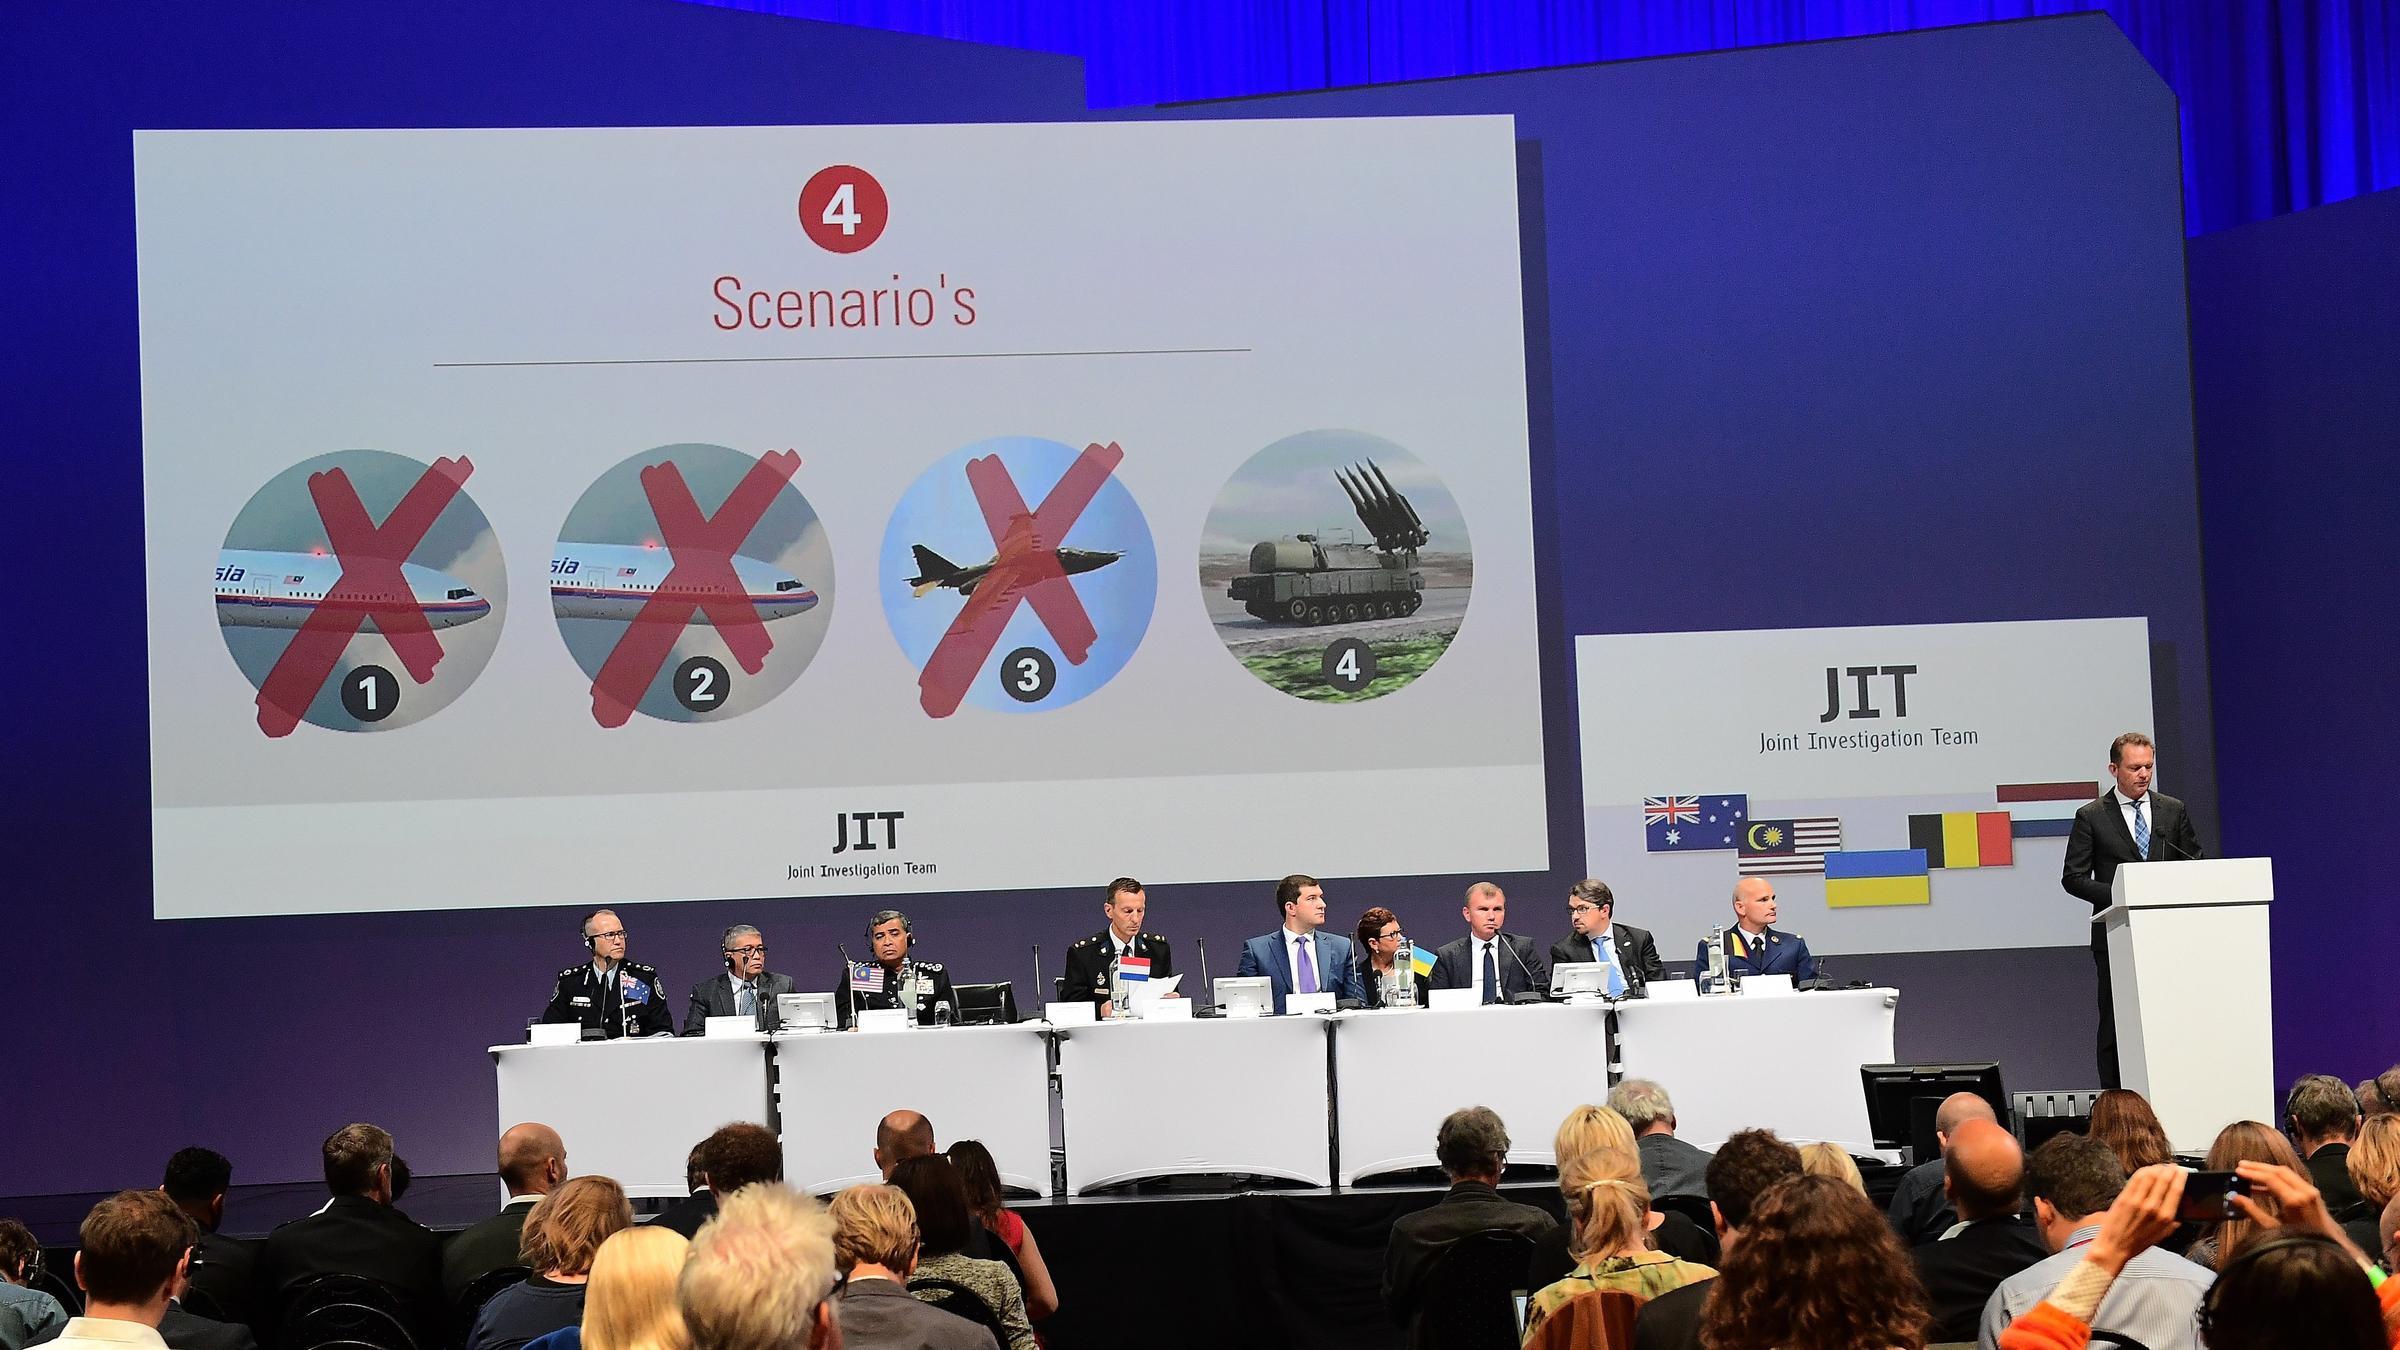 Dutch investigators to give results of MH17 criminal probe